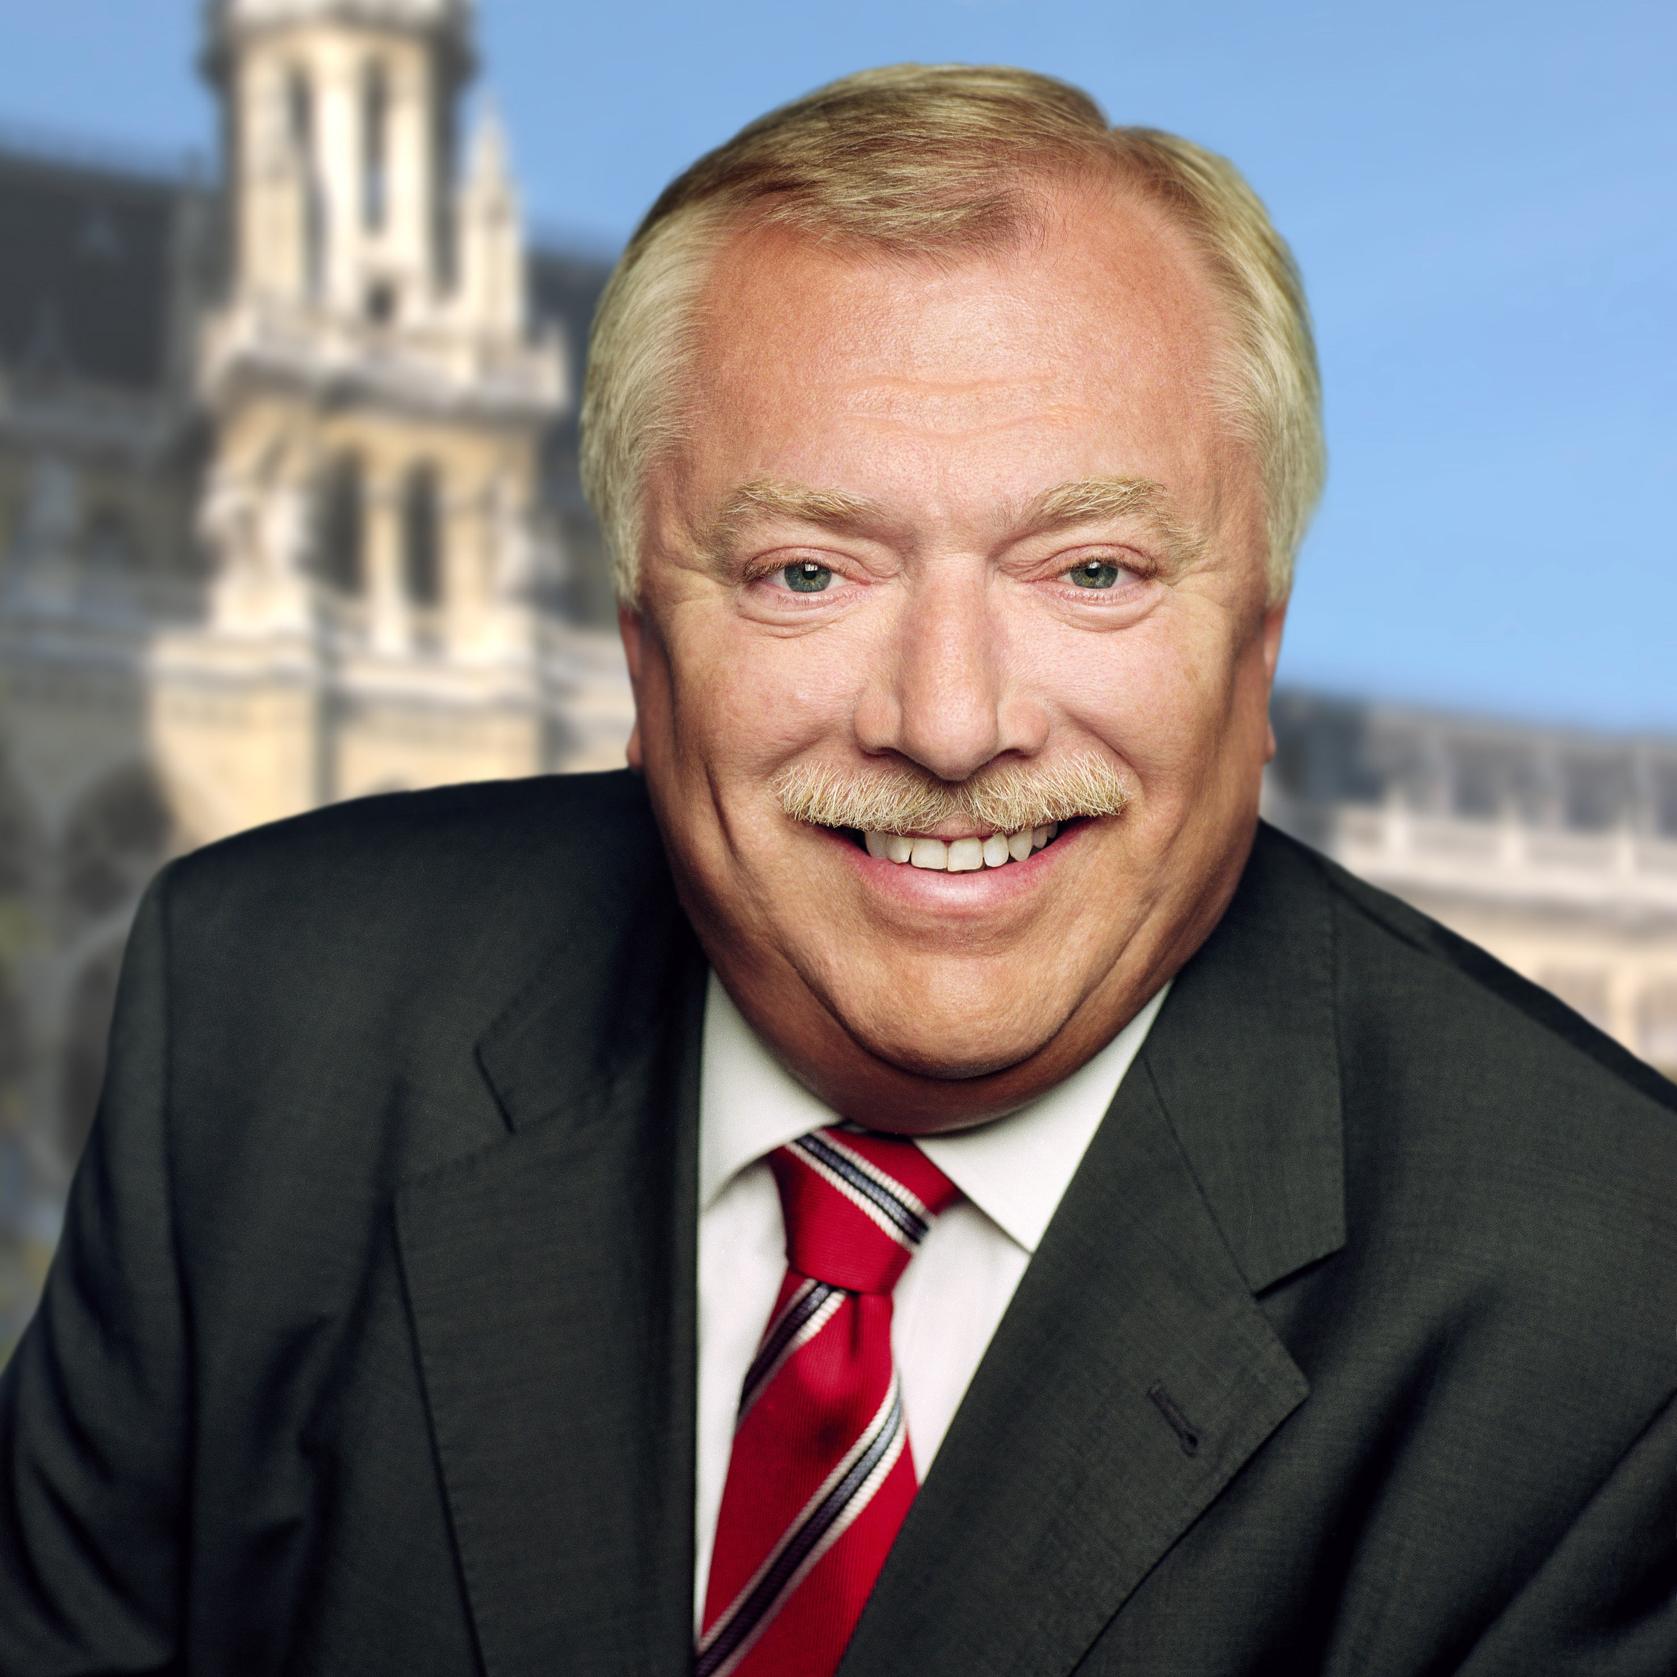 Bürgermeister Wien